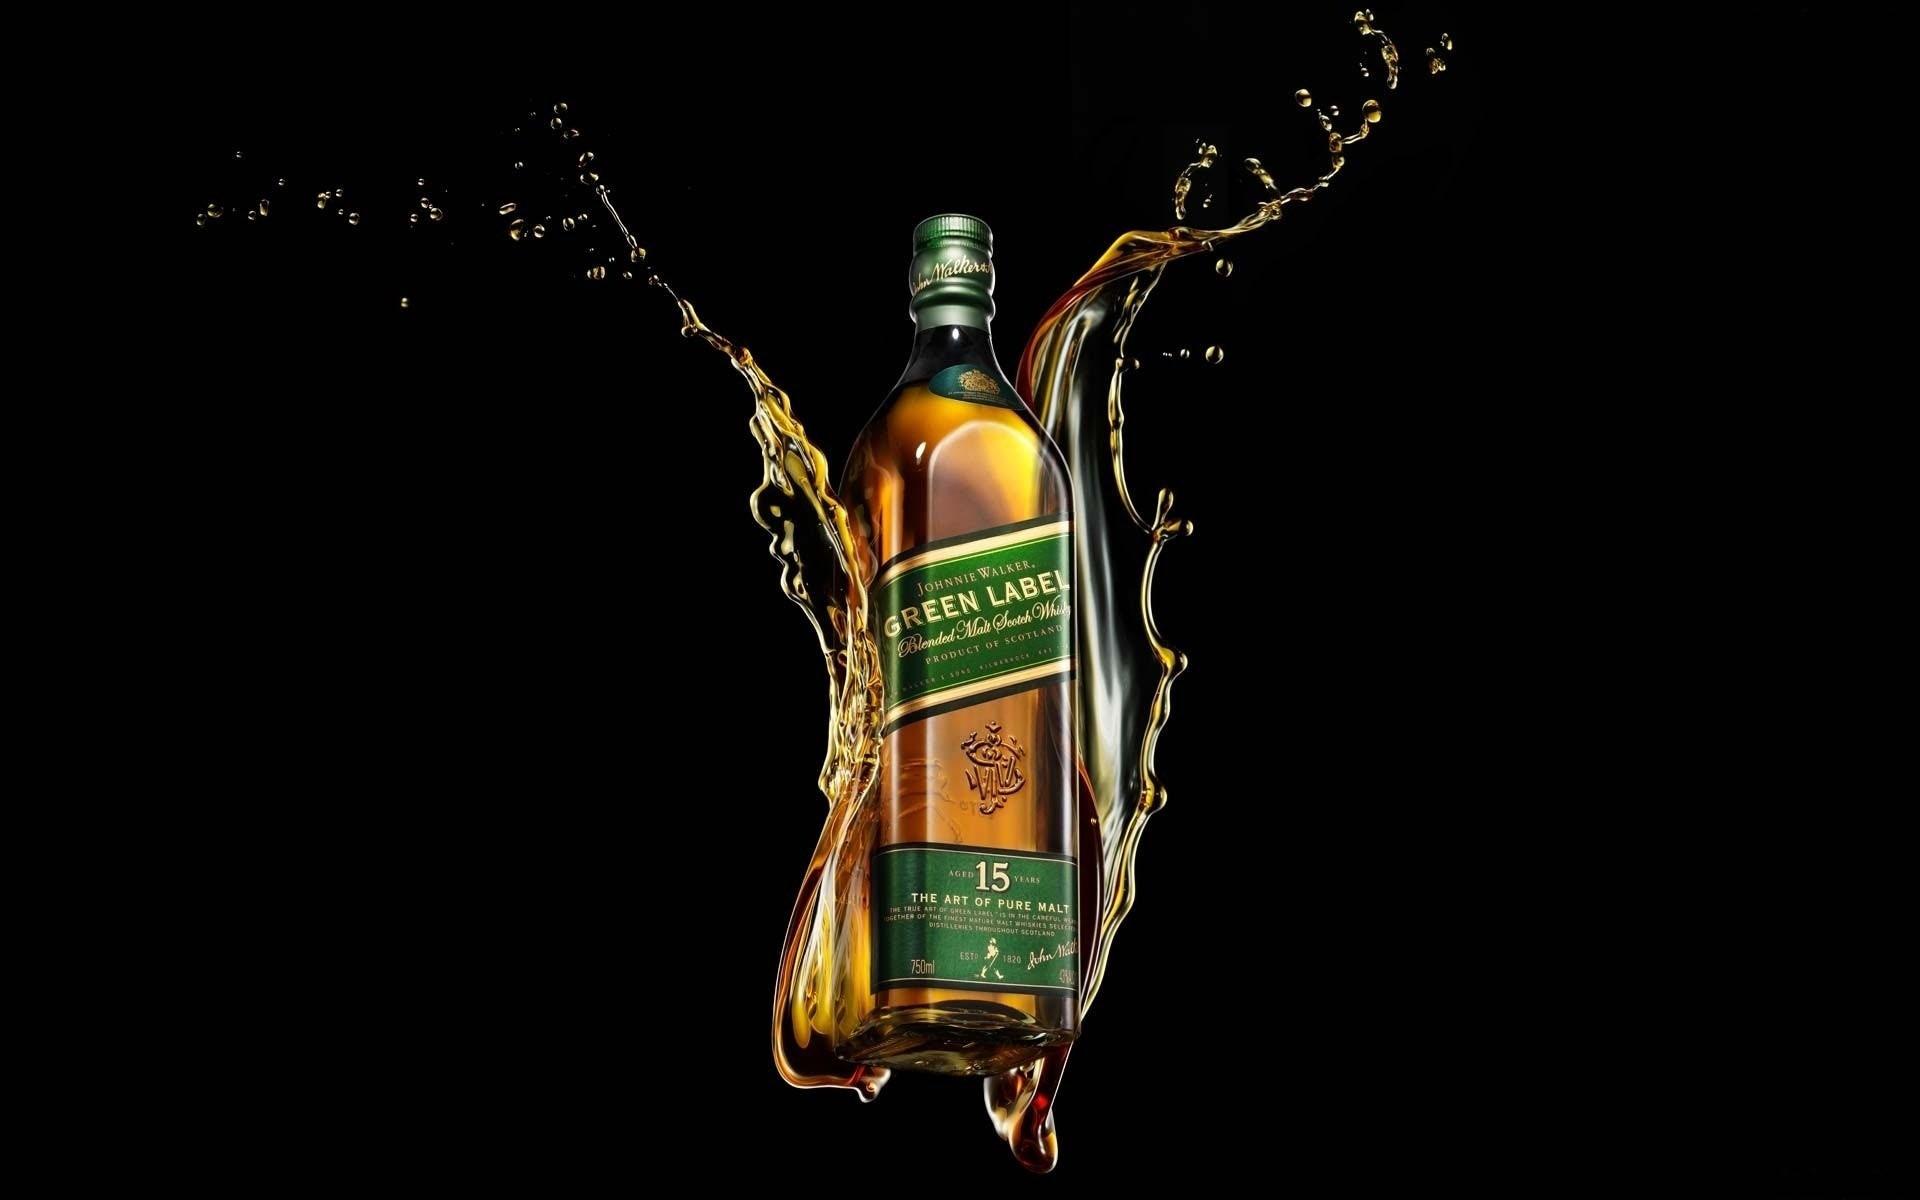 Wallpaper Johnnie walker, Green label, Whiskey, Bottle, Brand